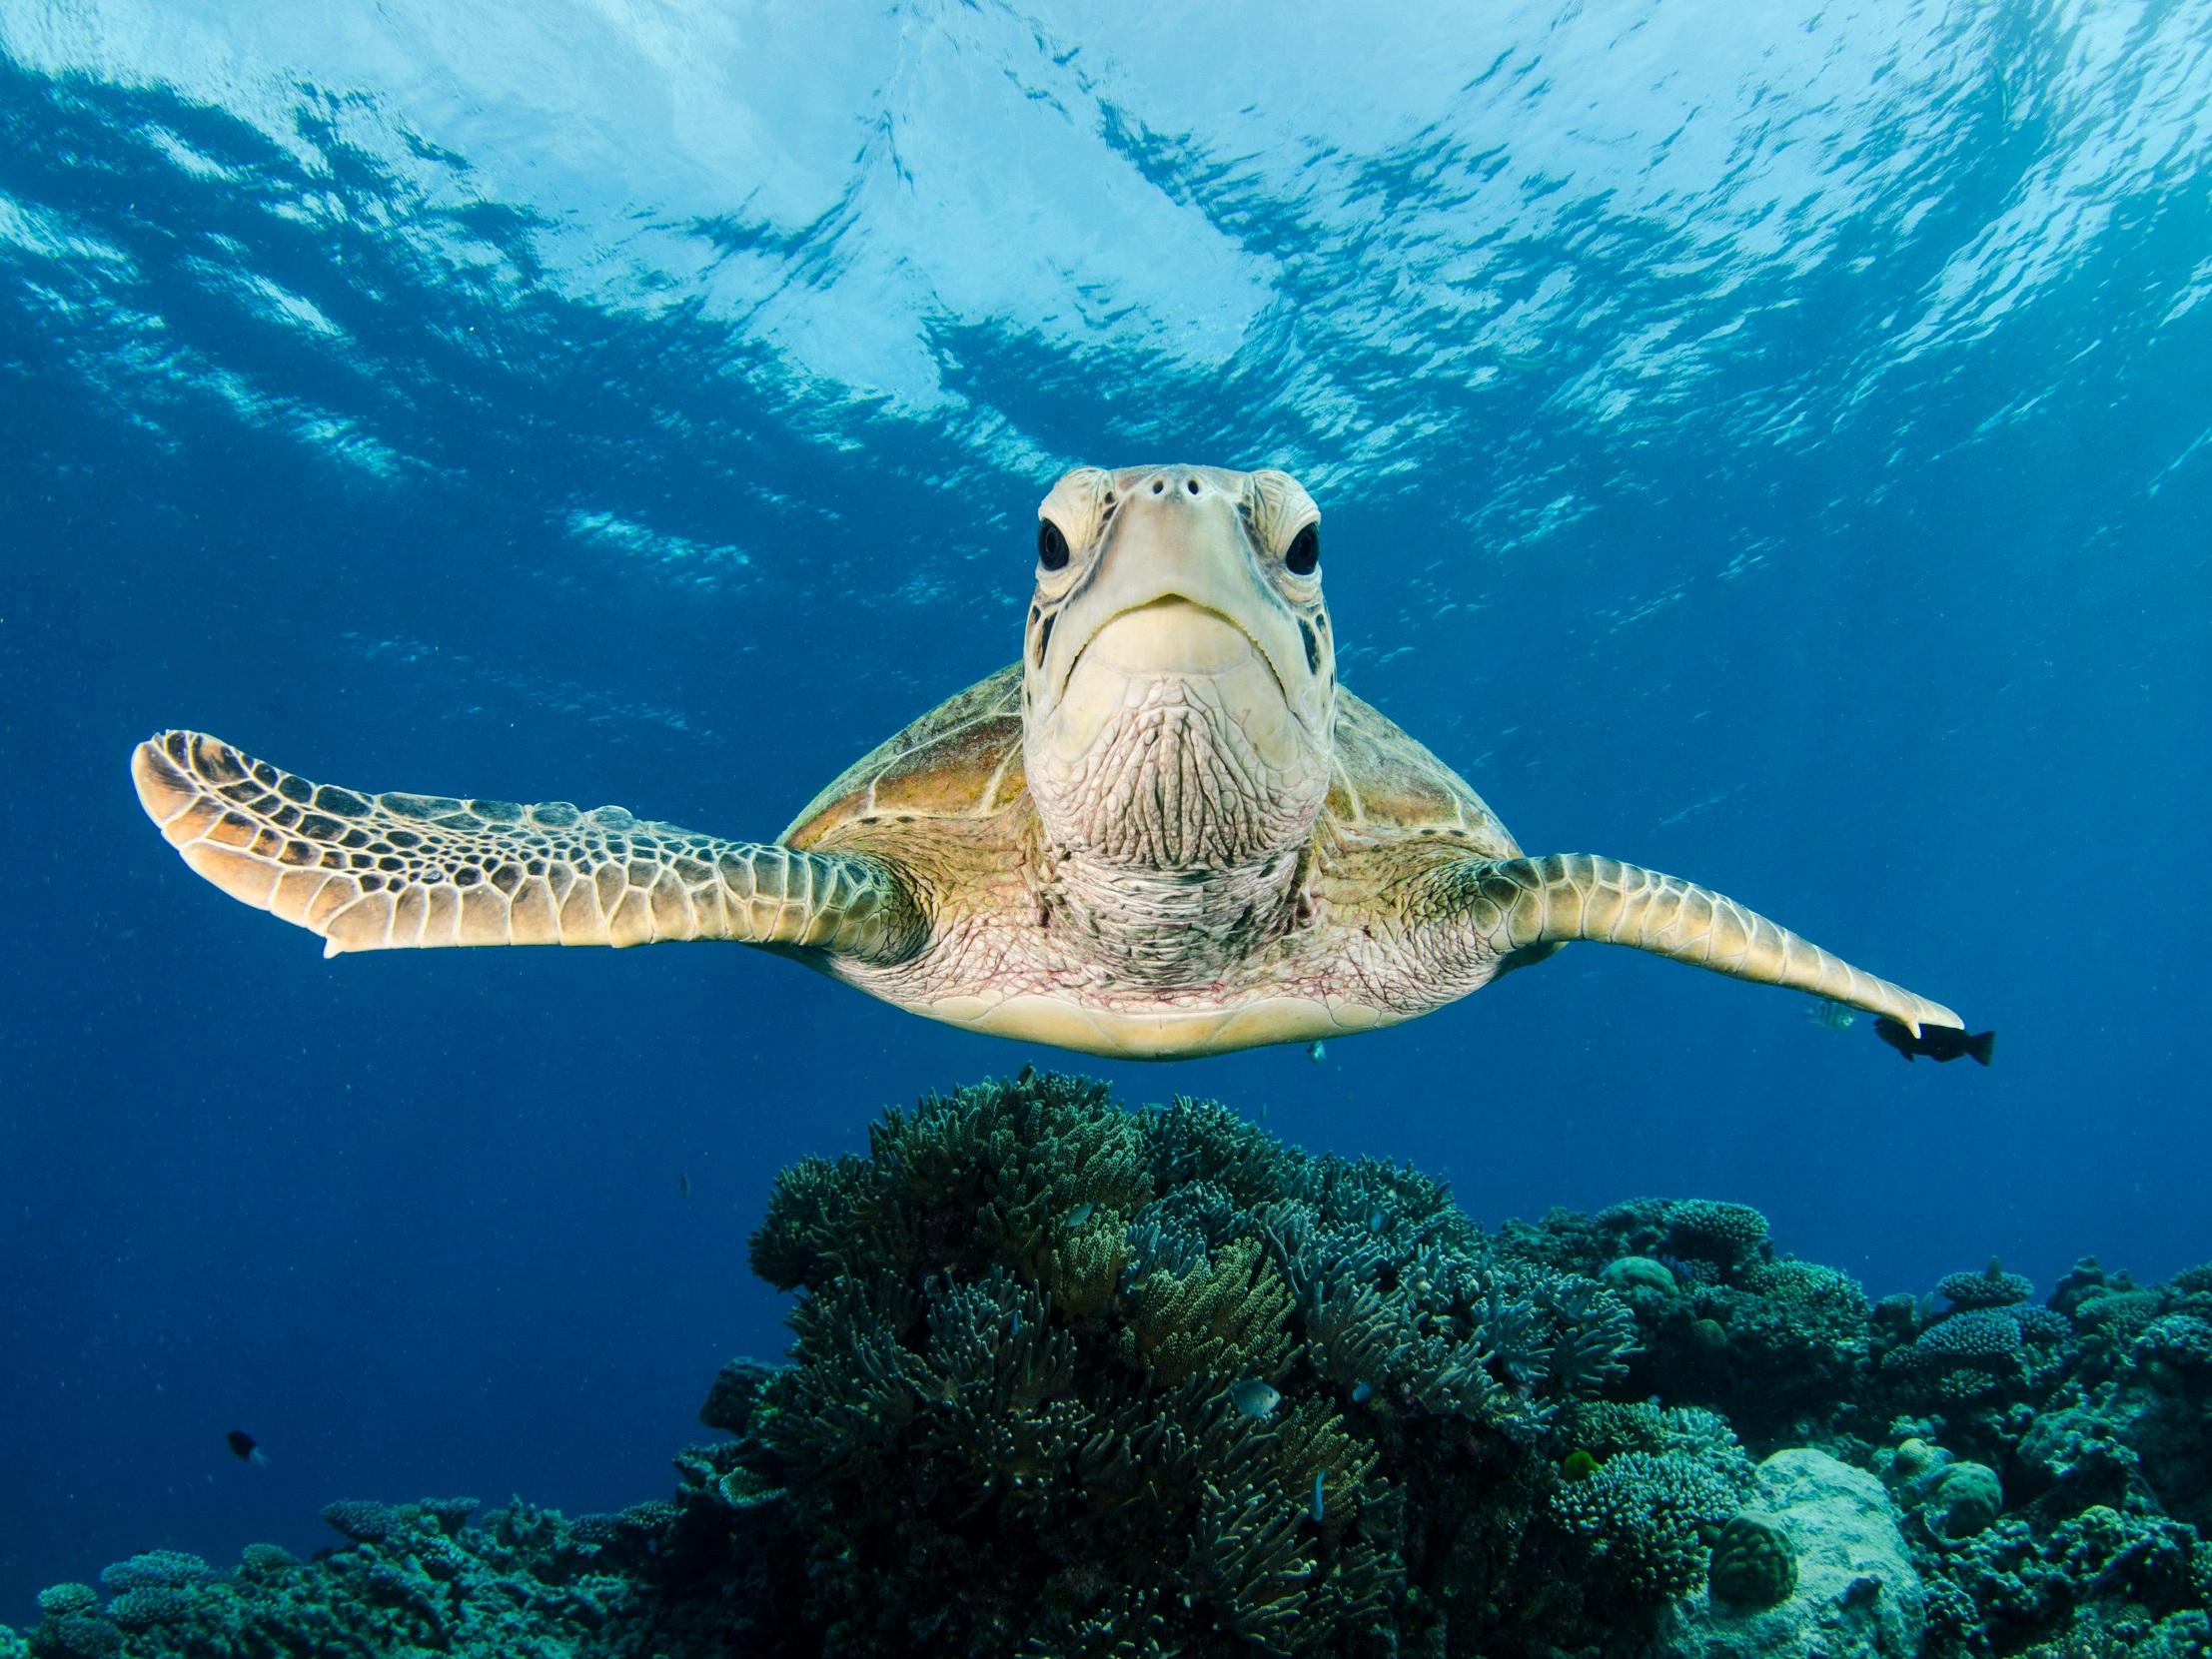 turtle credit: Amanda cotton / Coral reef image bank